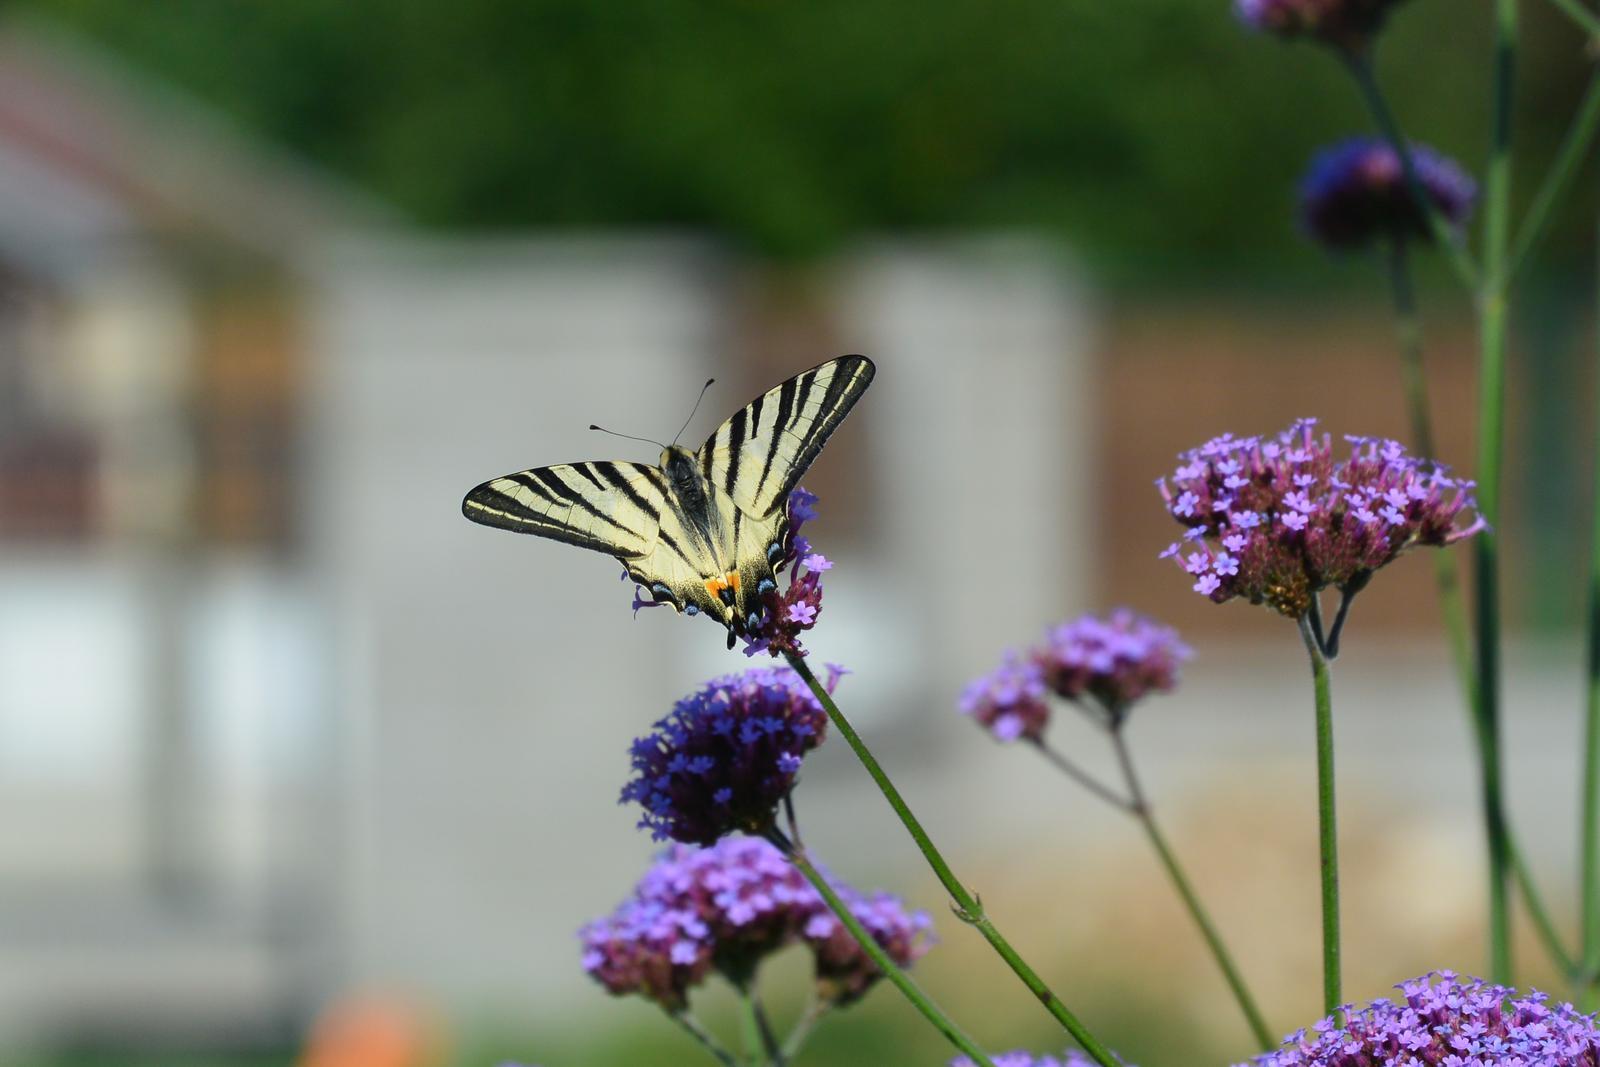 Motýlí zahrada 2019-2020 - Obrázek č. 229